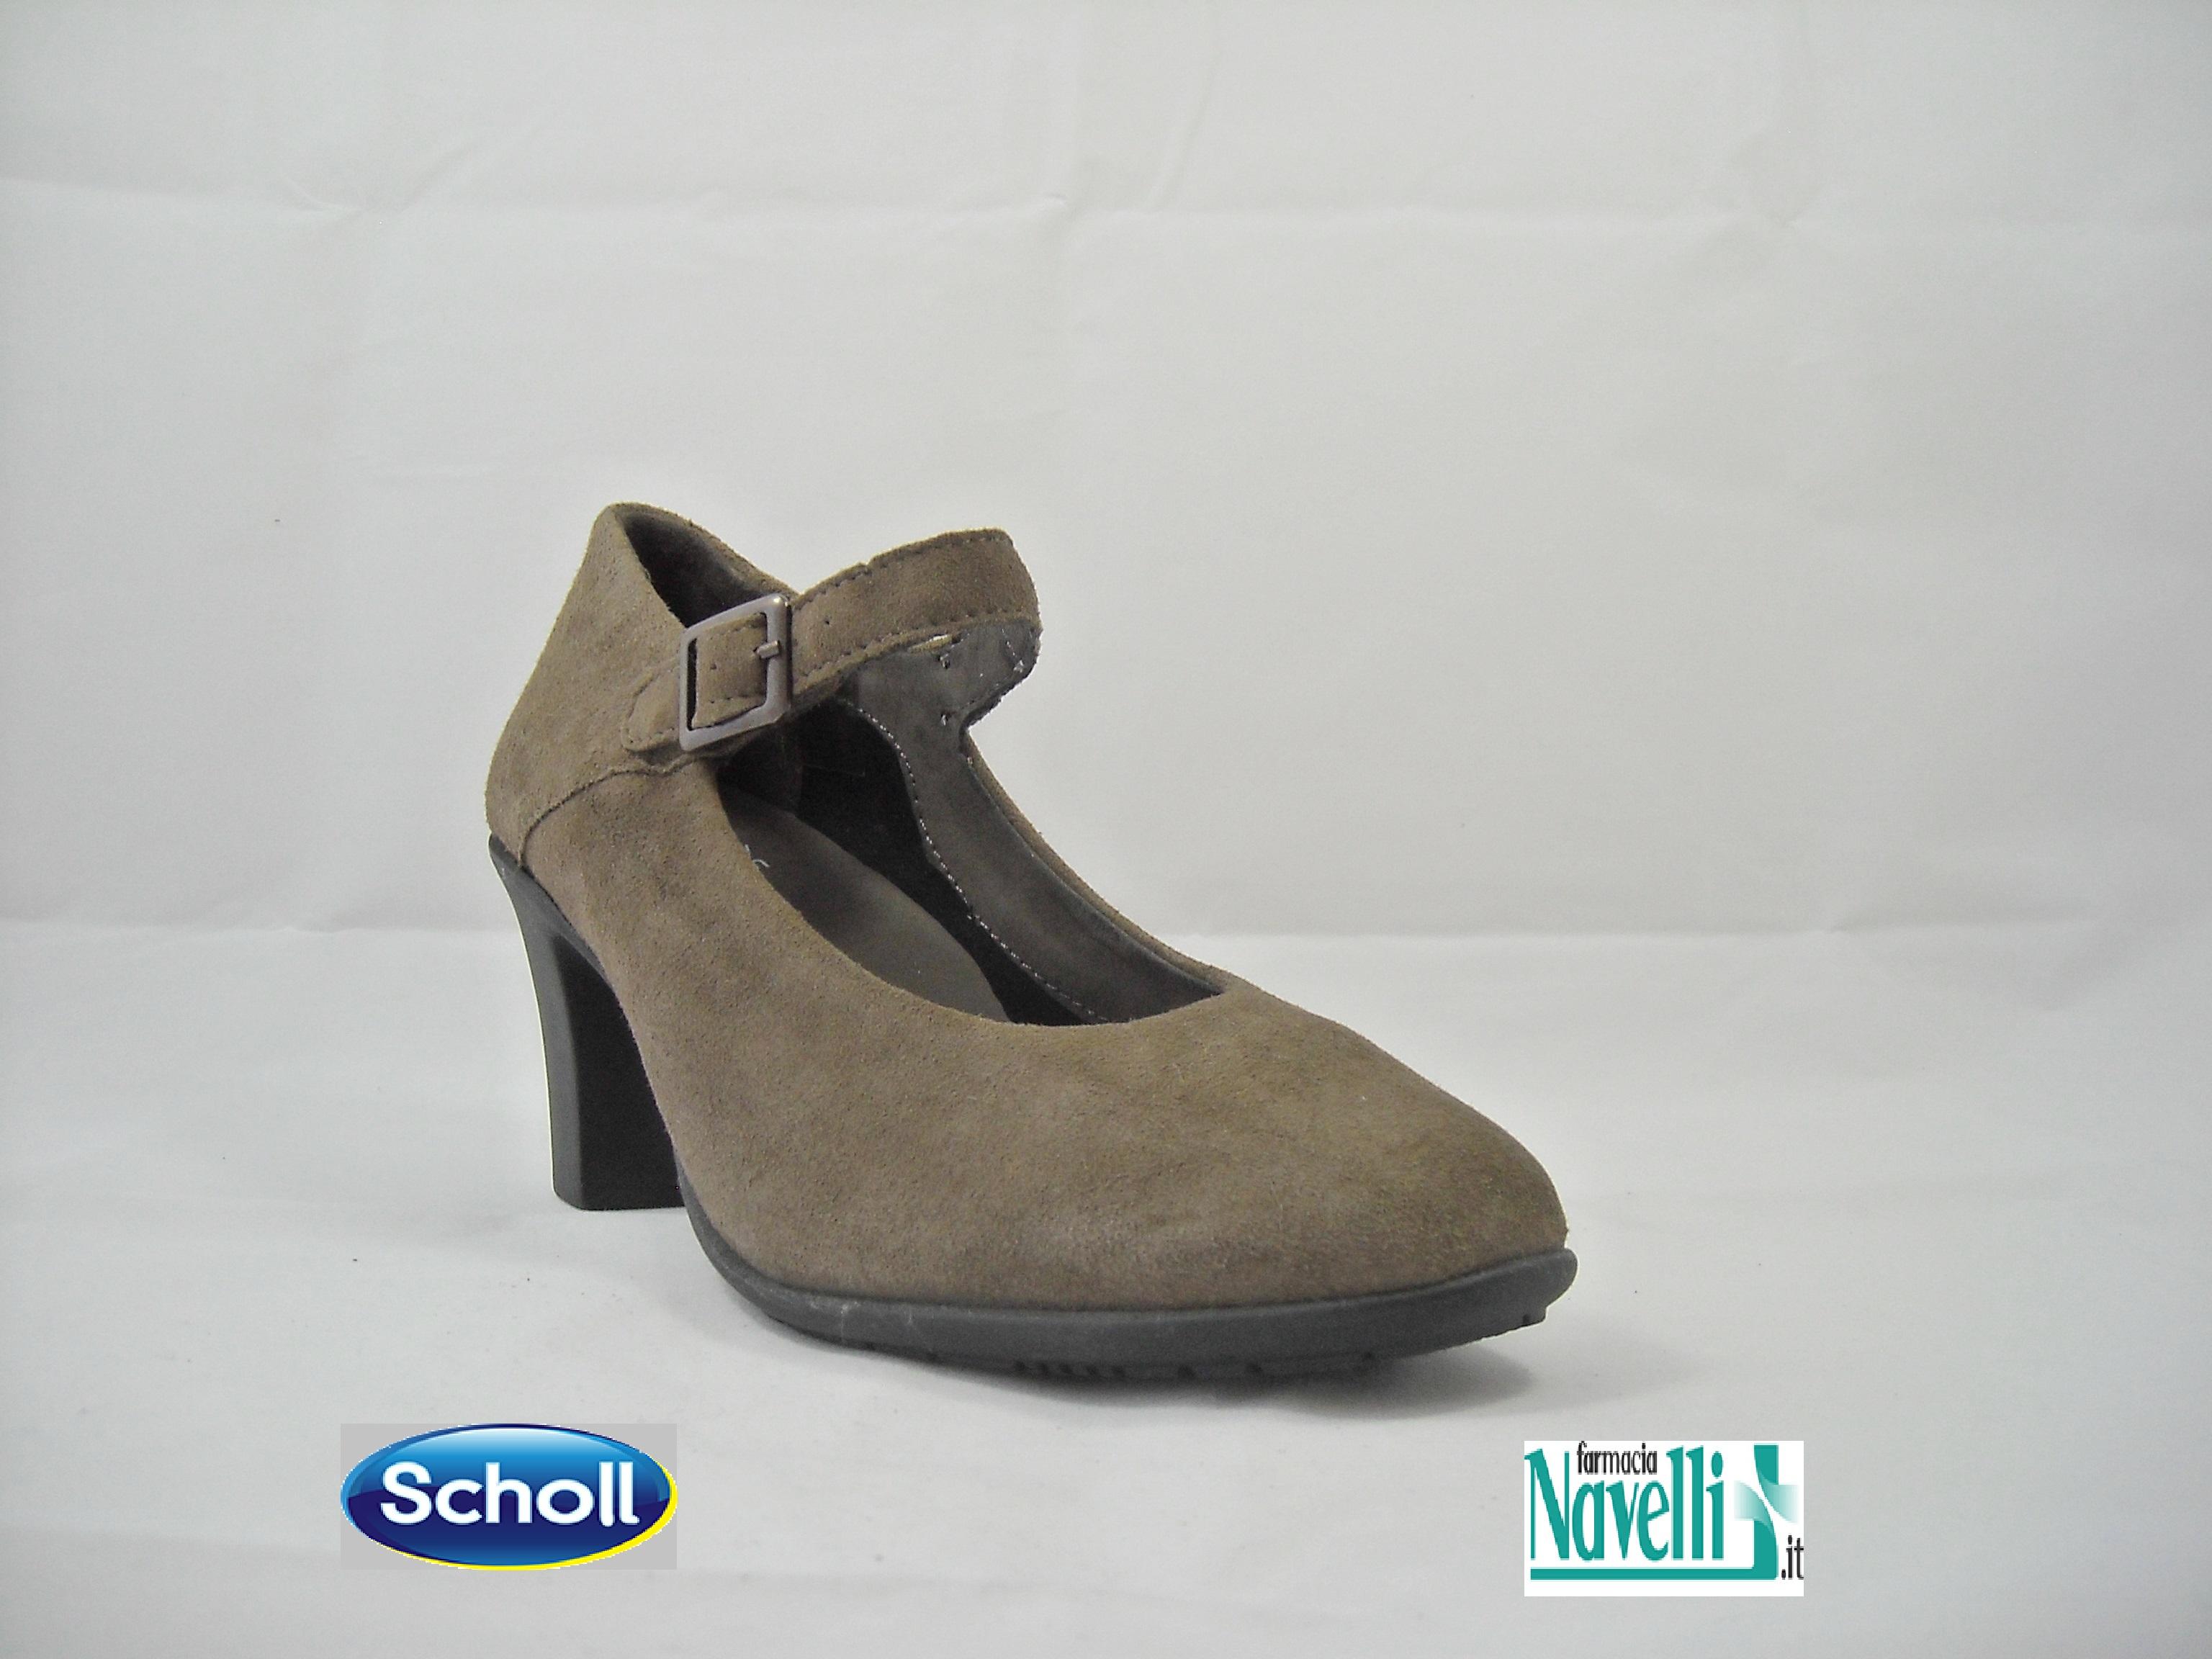 SCARPA DR SCHOLL JUDIT - Farmacia Navelli fee2aa4520e